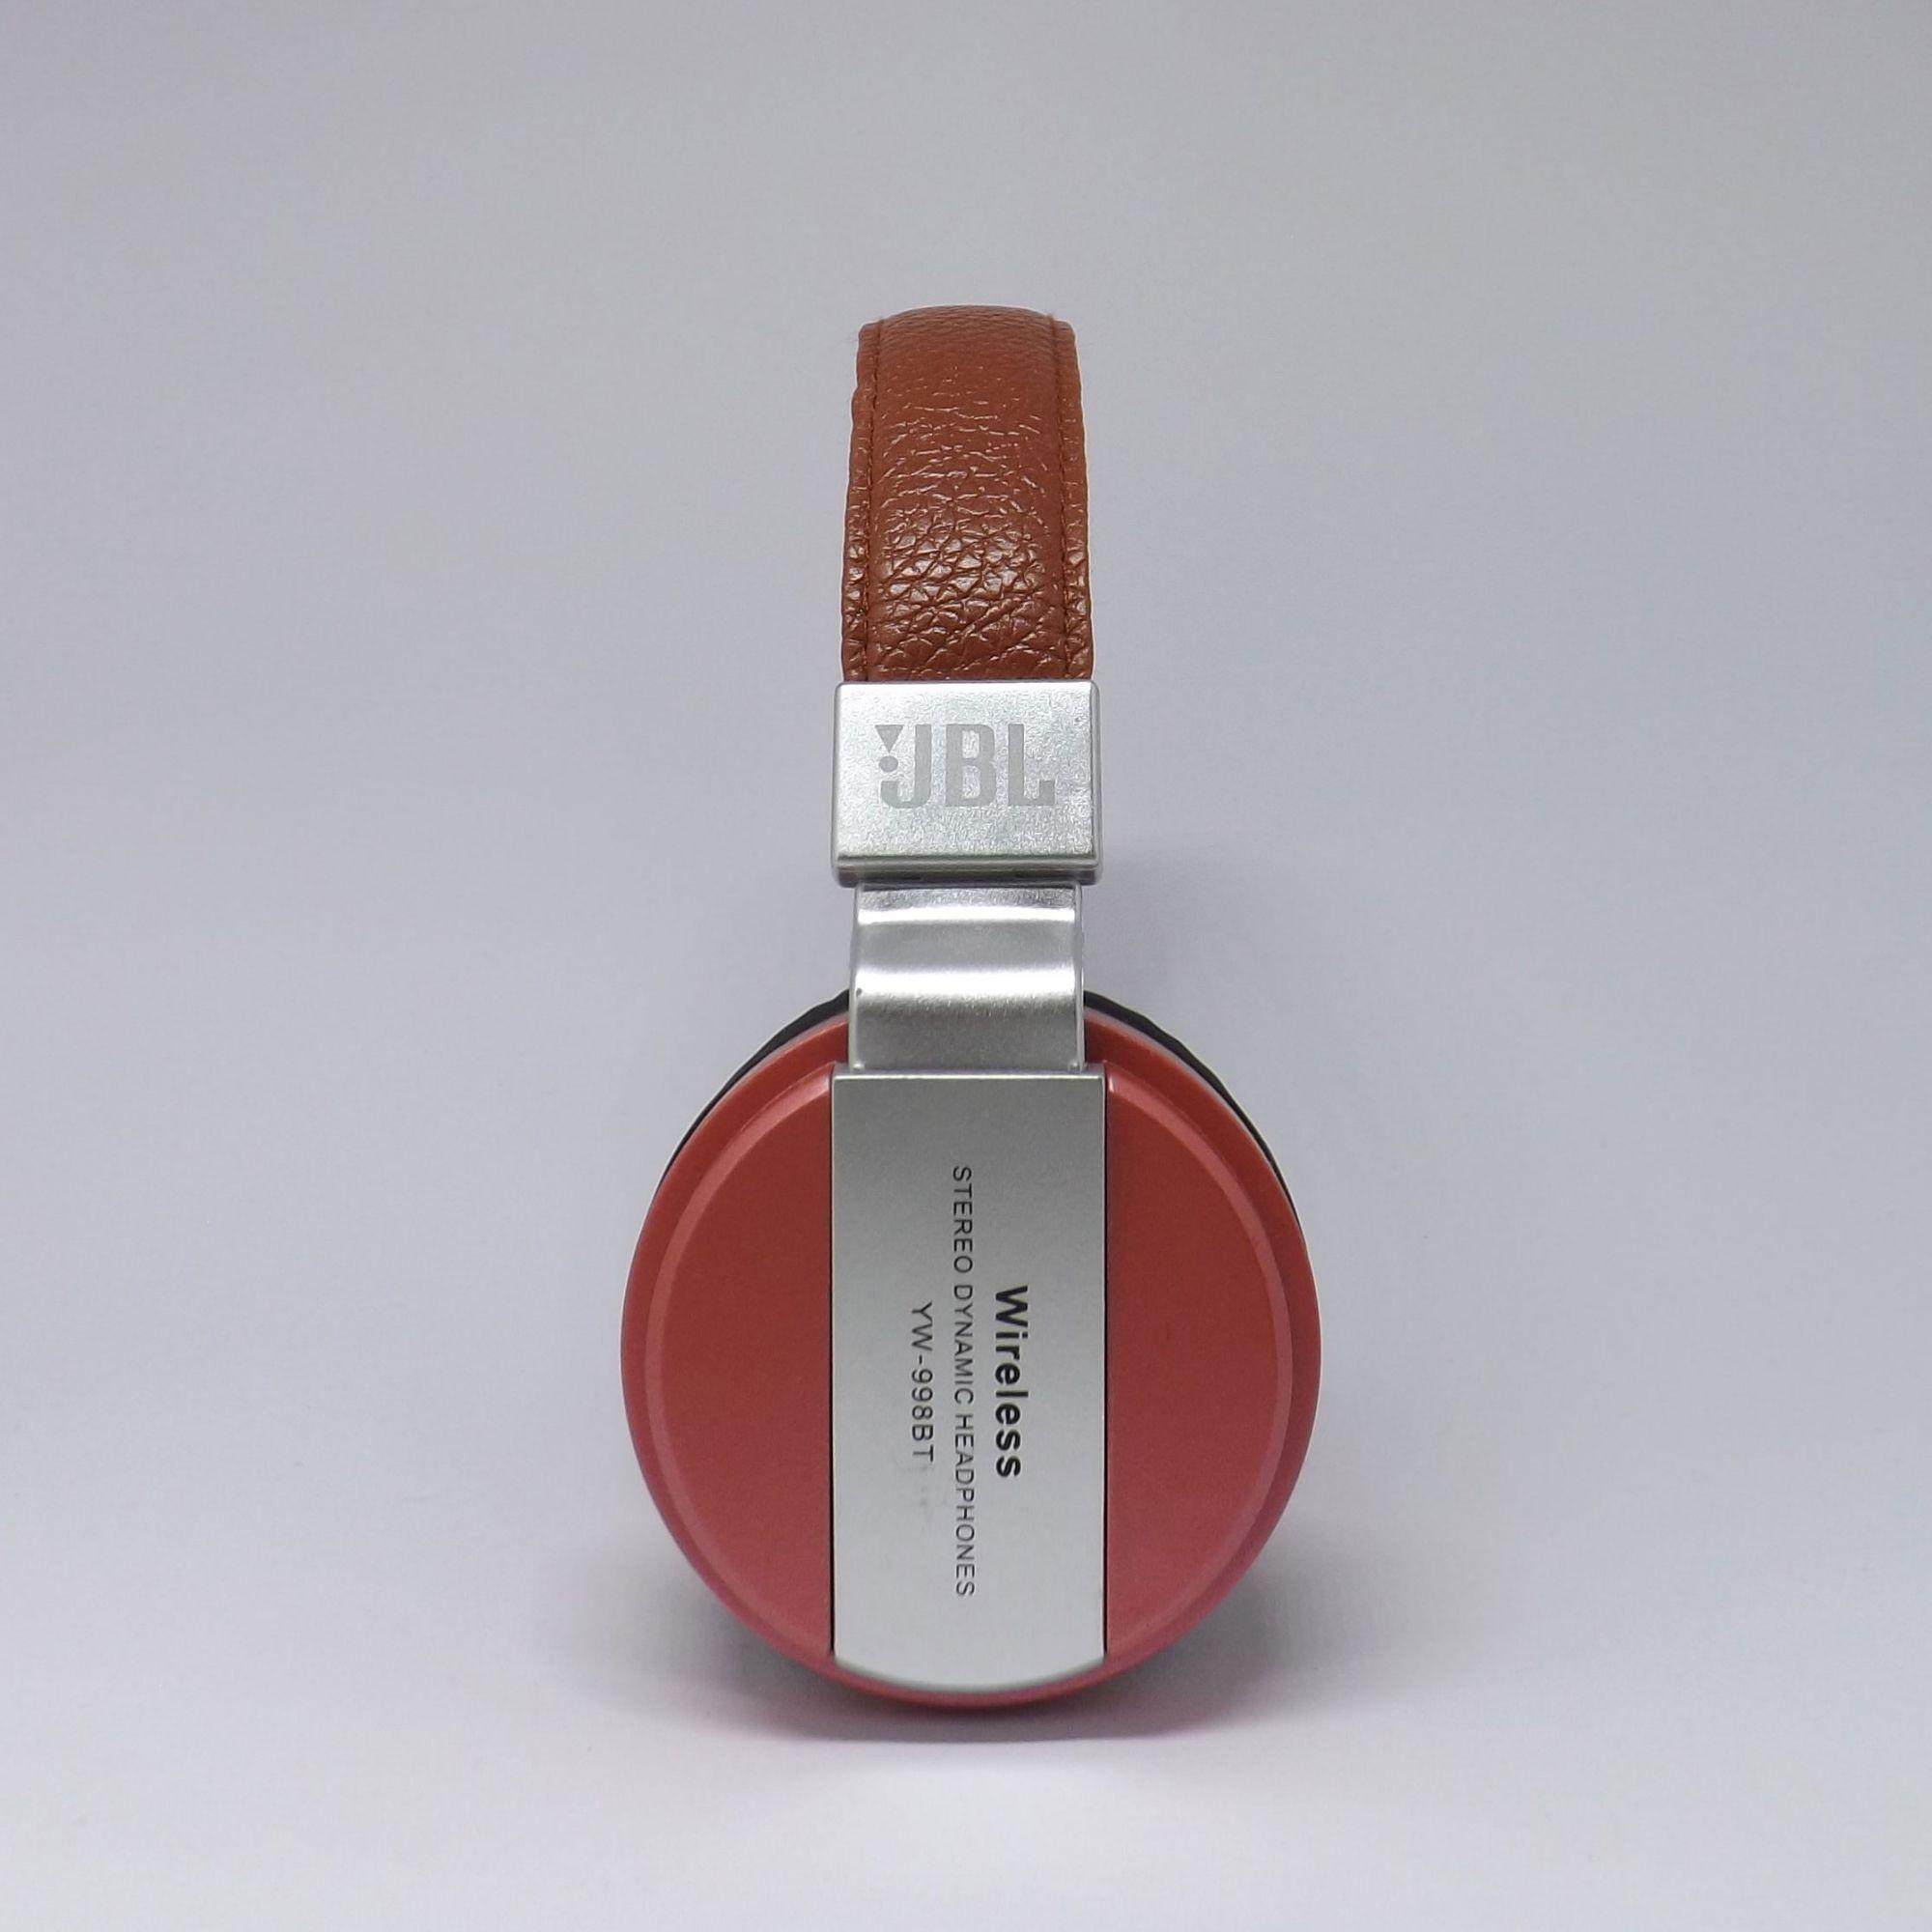 Fone de Ouvido YW-998BT Bluetooth